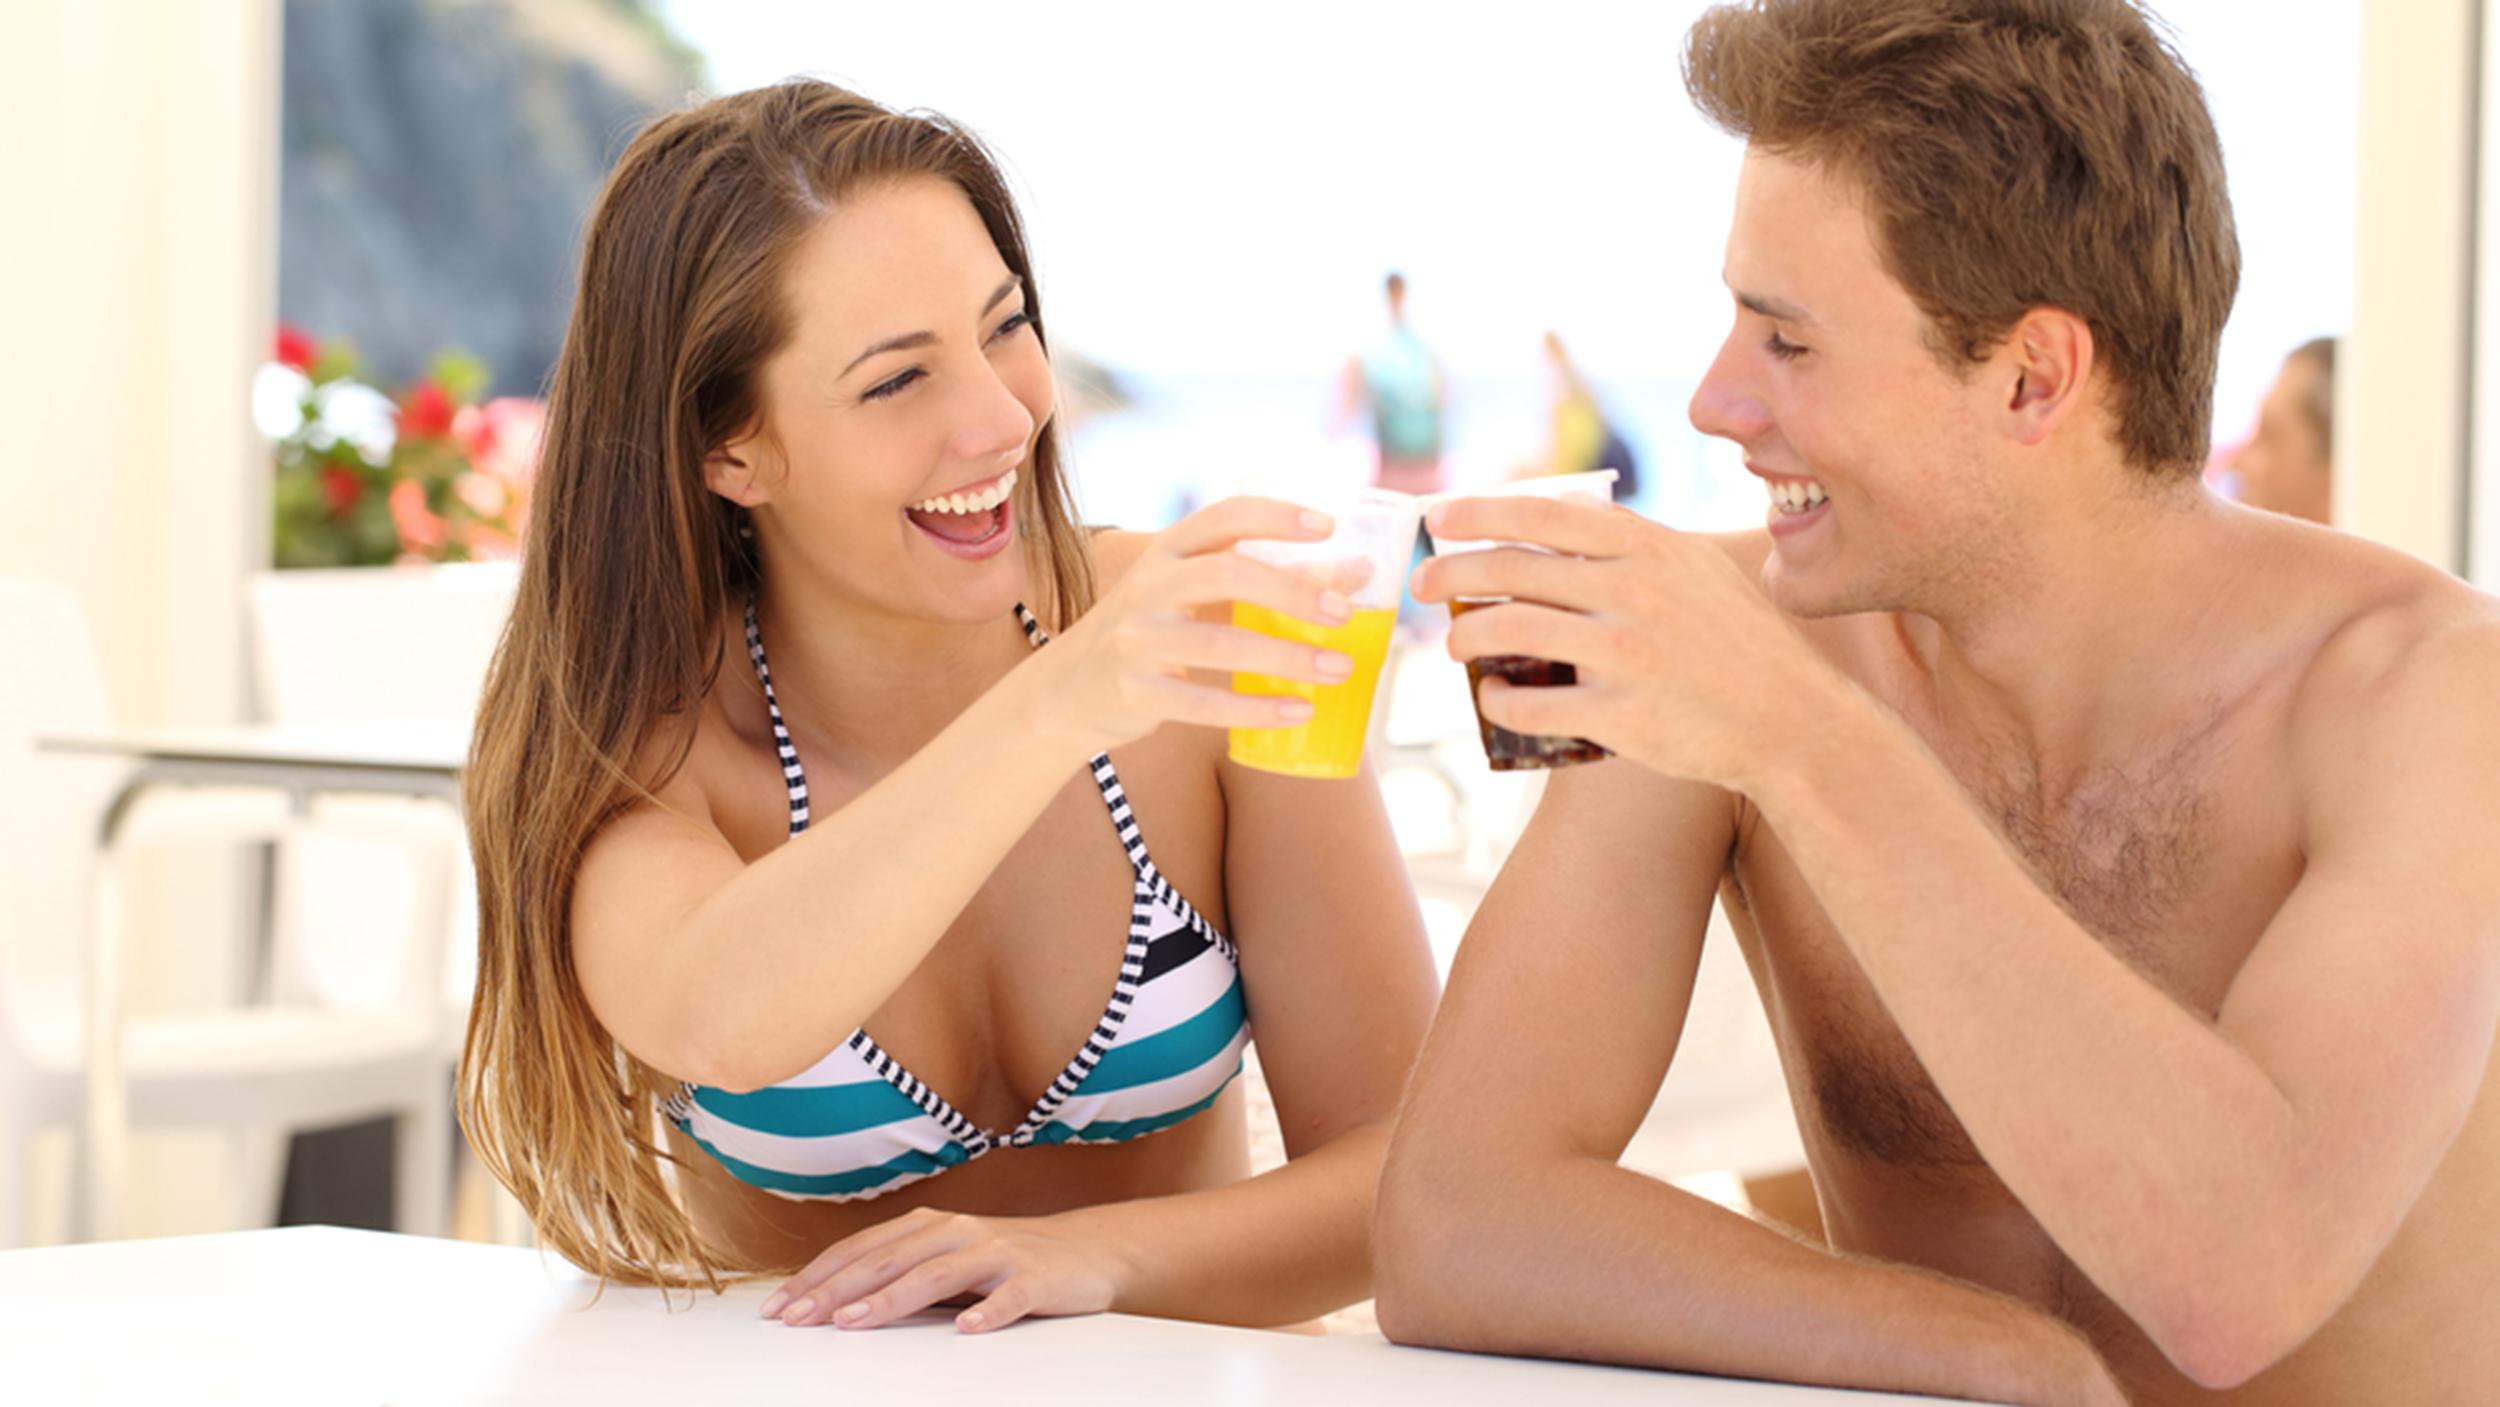 christian dating etiquette